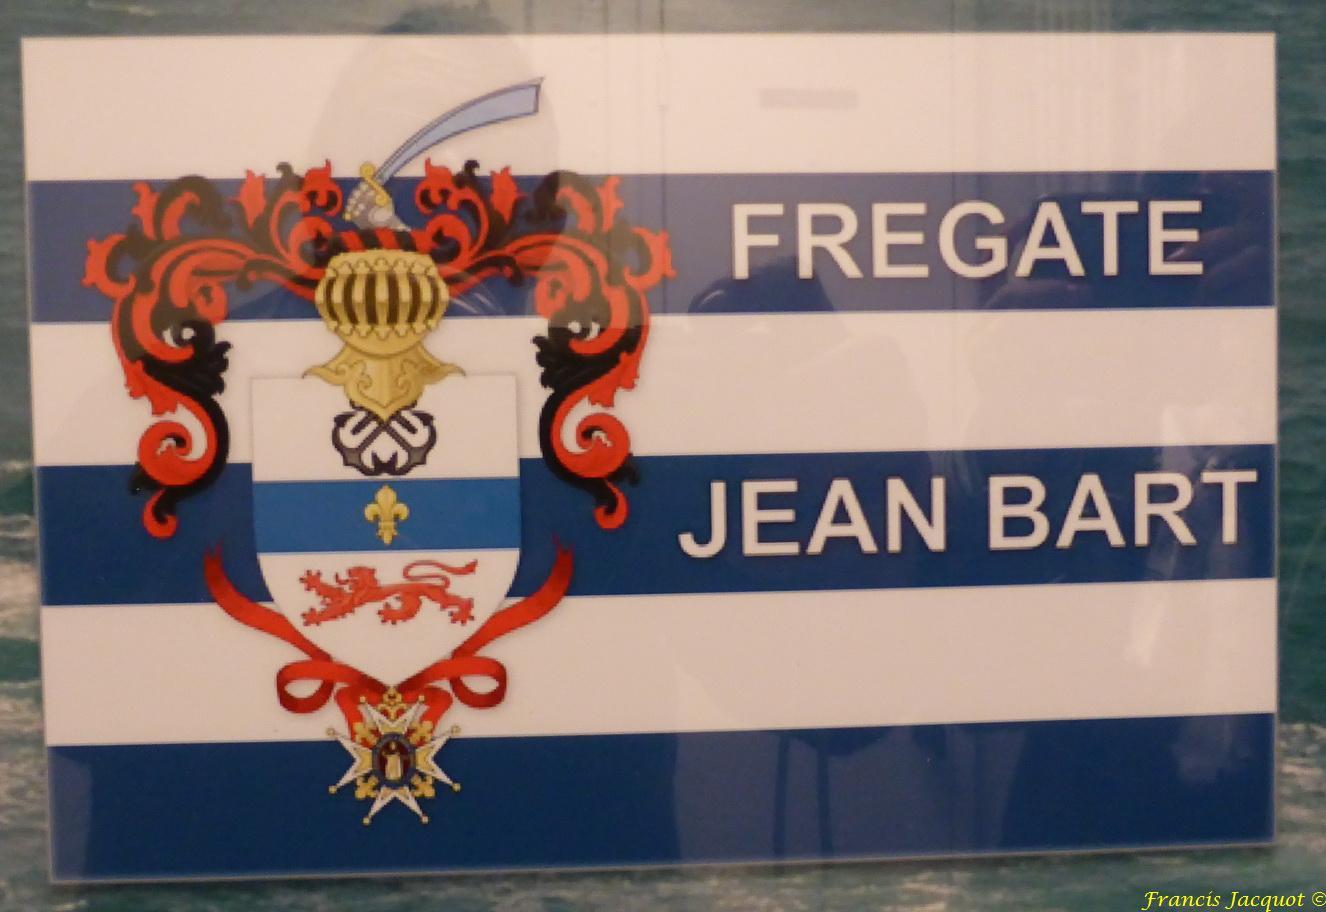 JEAN BART (FRÉGATE) - Page 4 1126477502